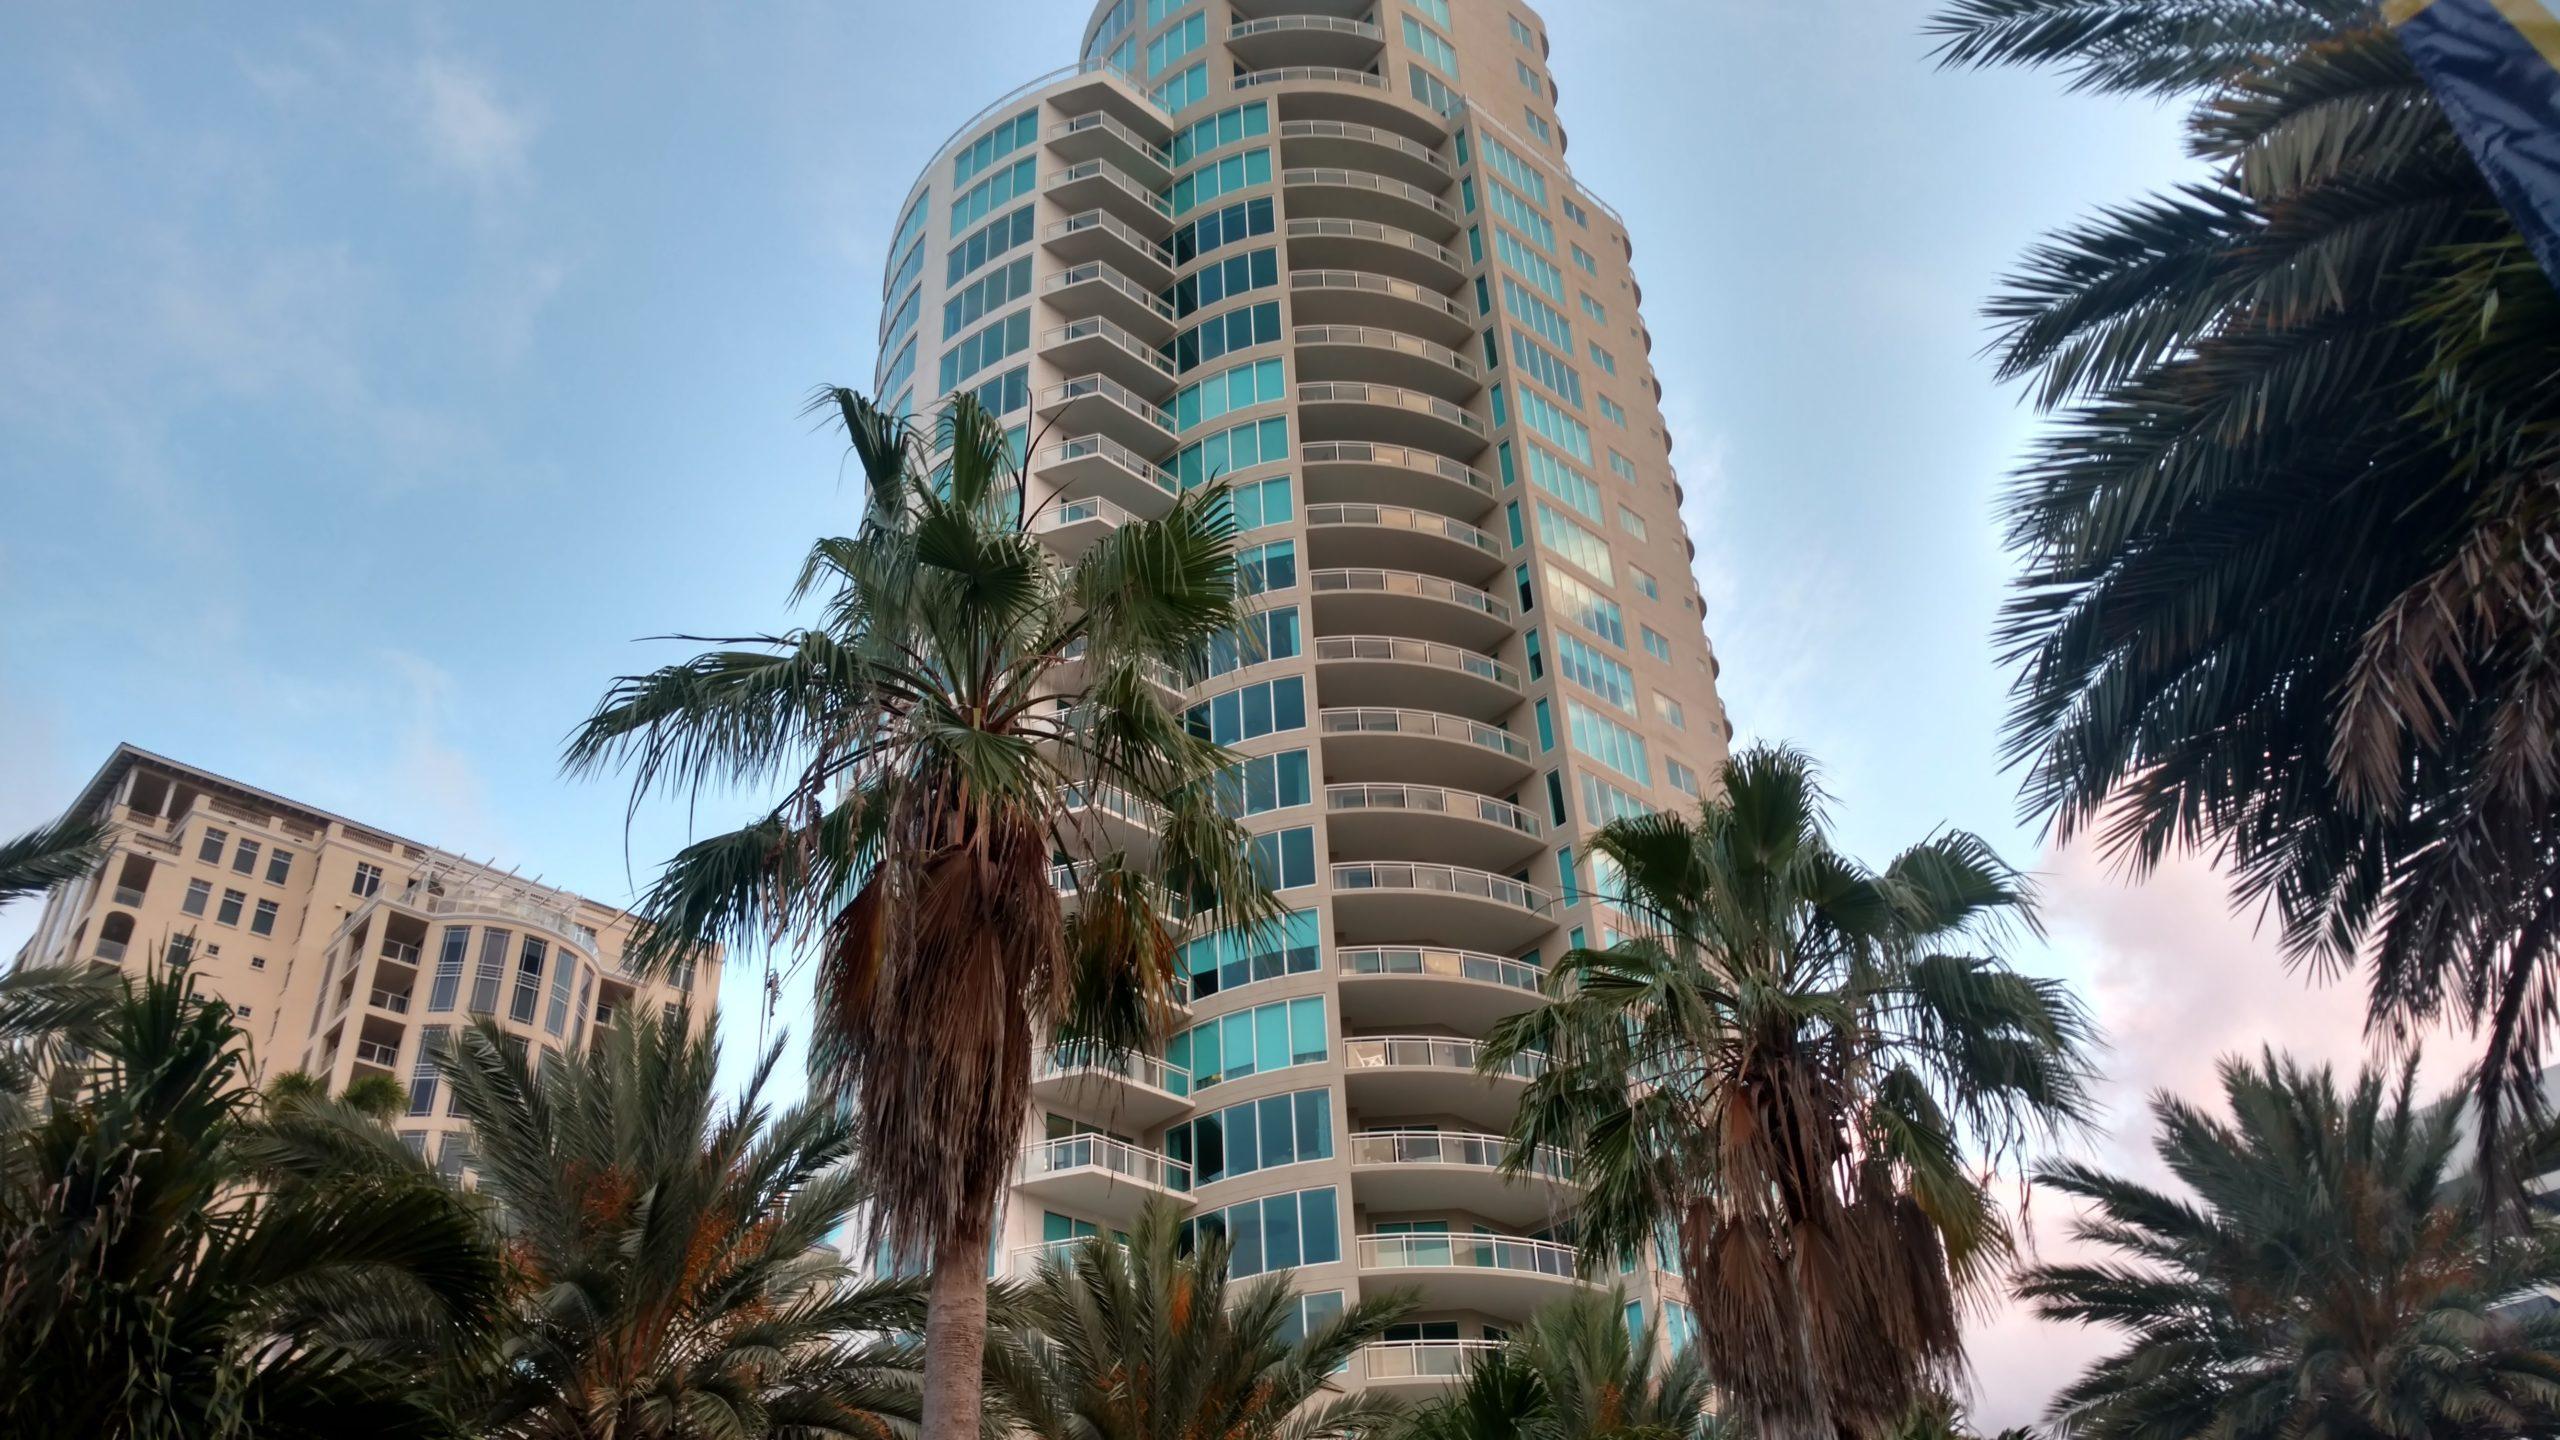 Condo High Rise Downtown St Pete FL